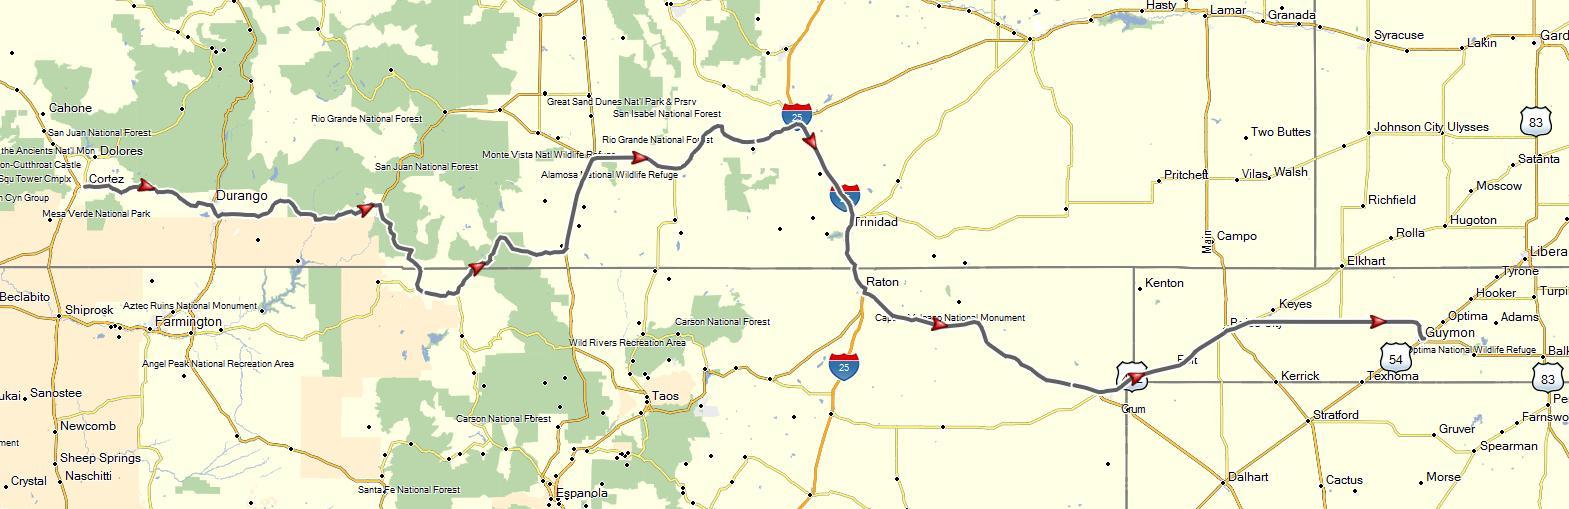 Cortez, CO to Springdale, AR (June 19-20, 2015) | Don Moe\'s Travel ...